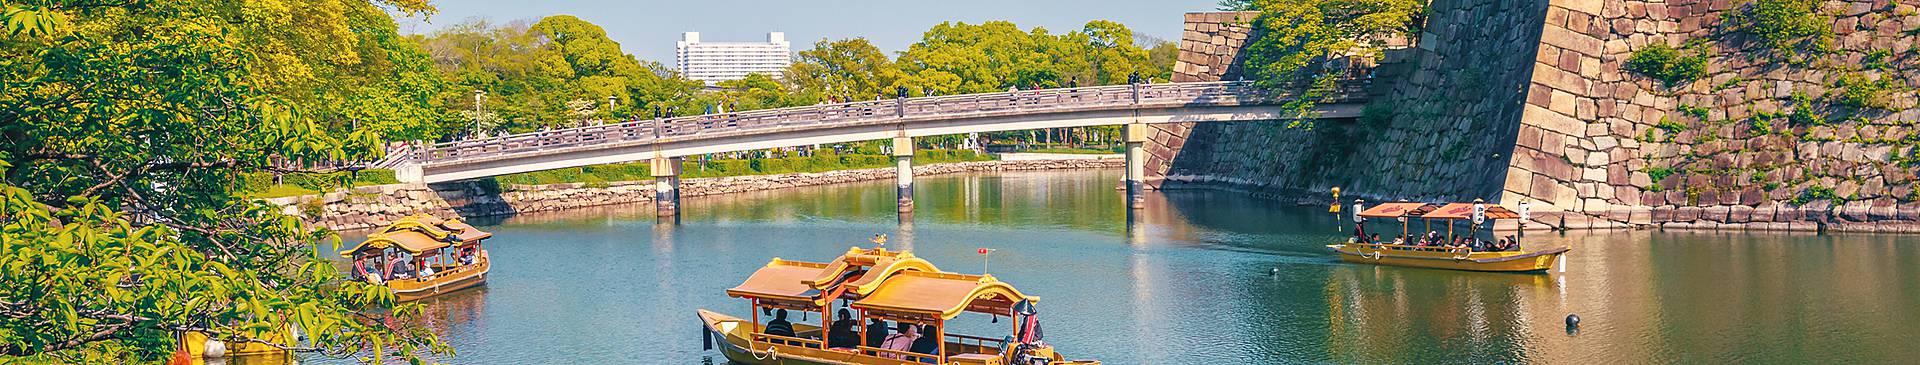 Japan river cruise